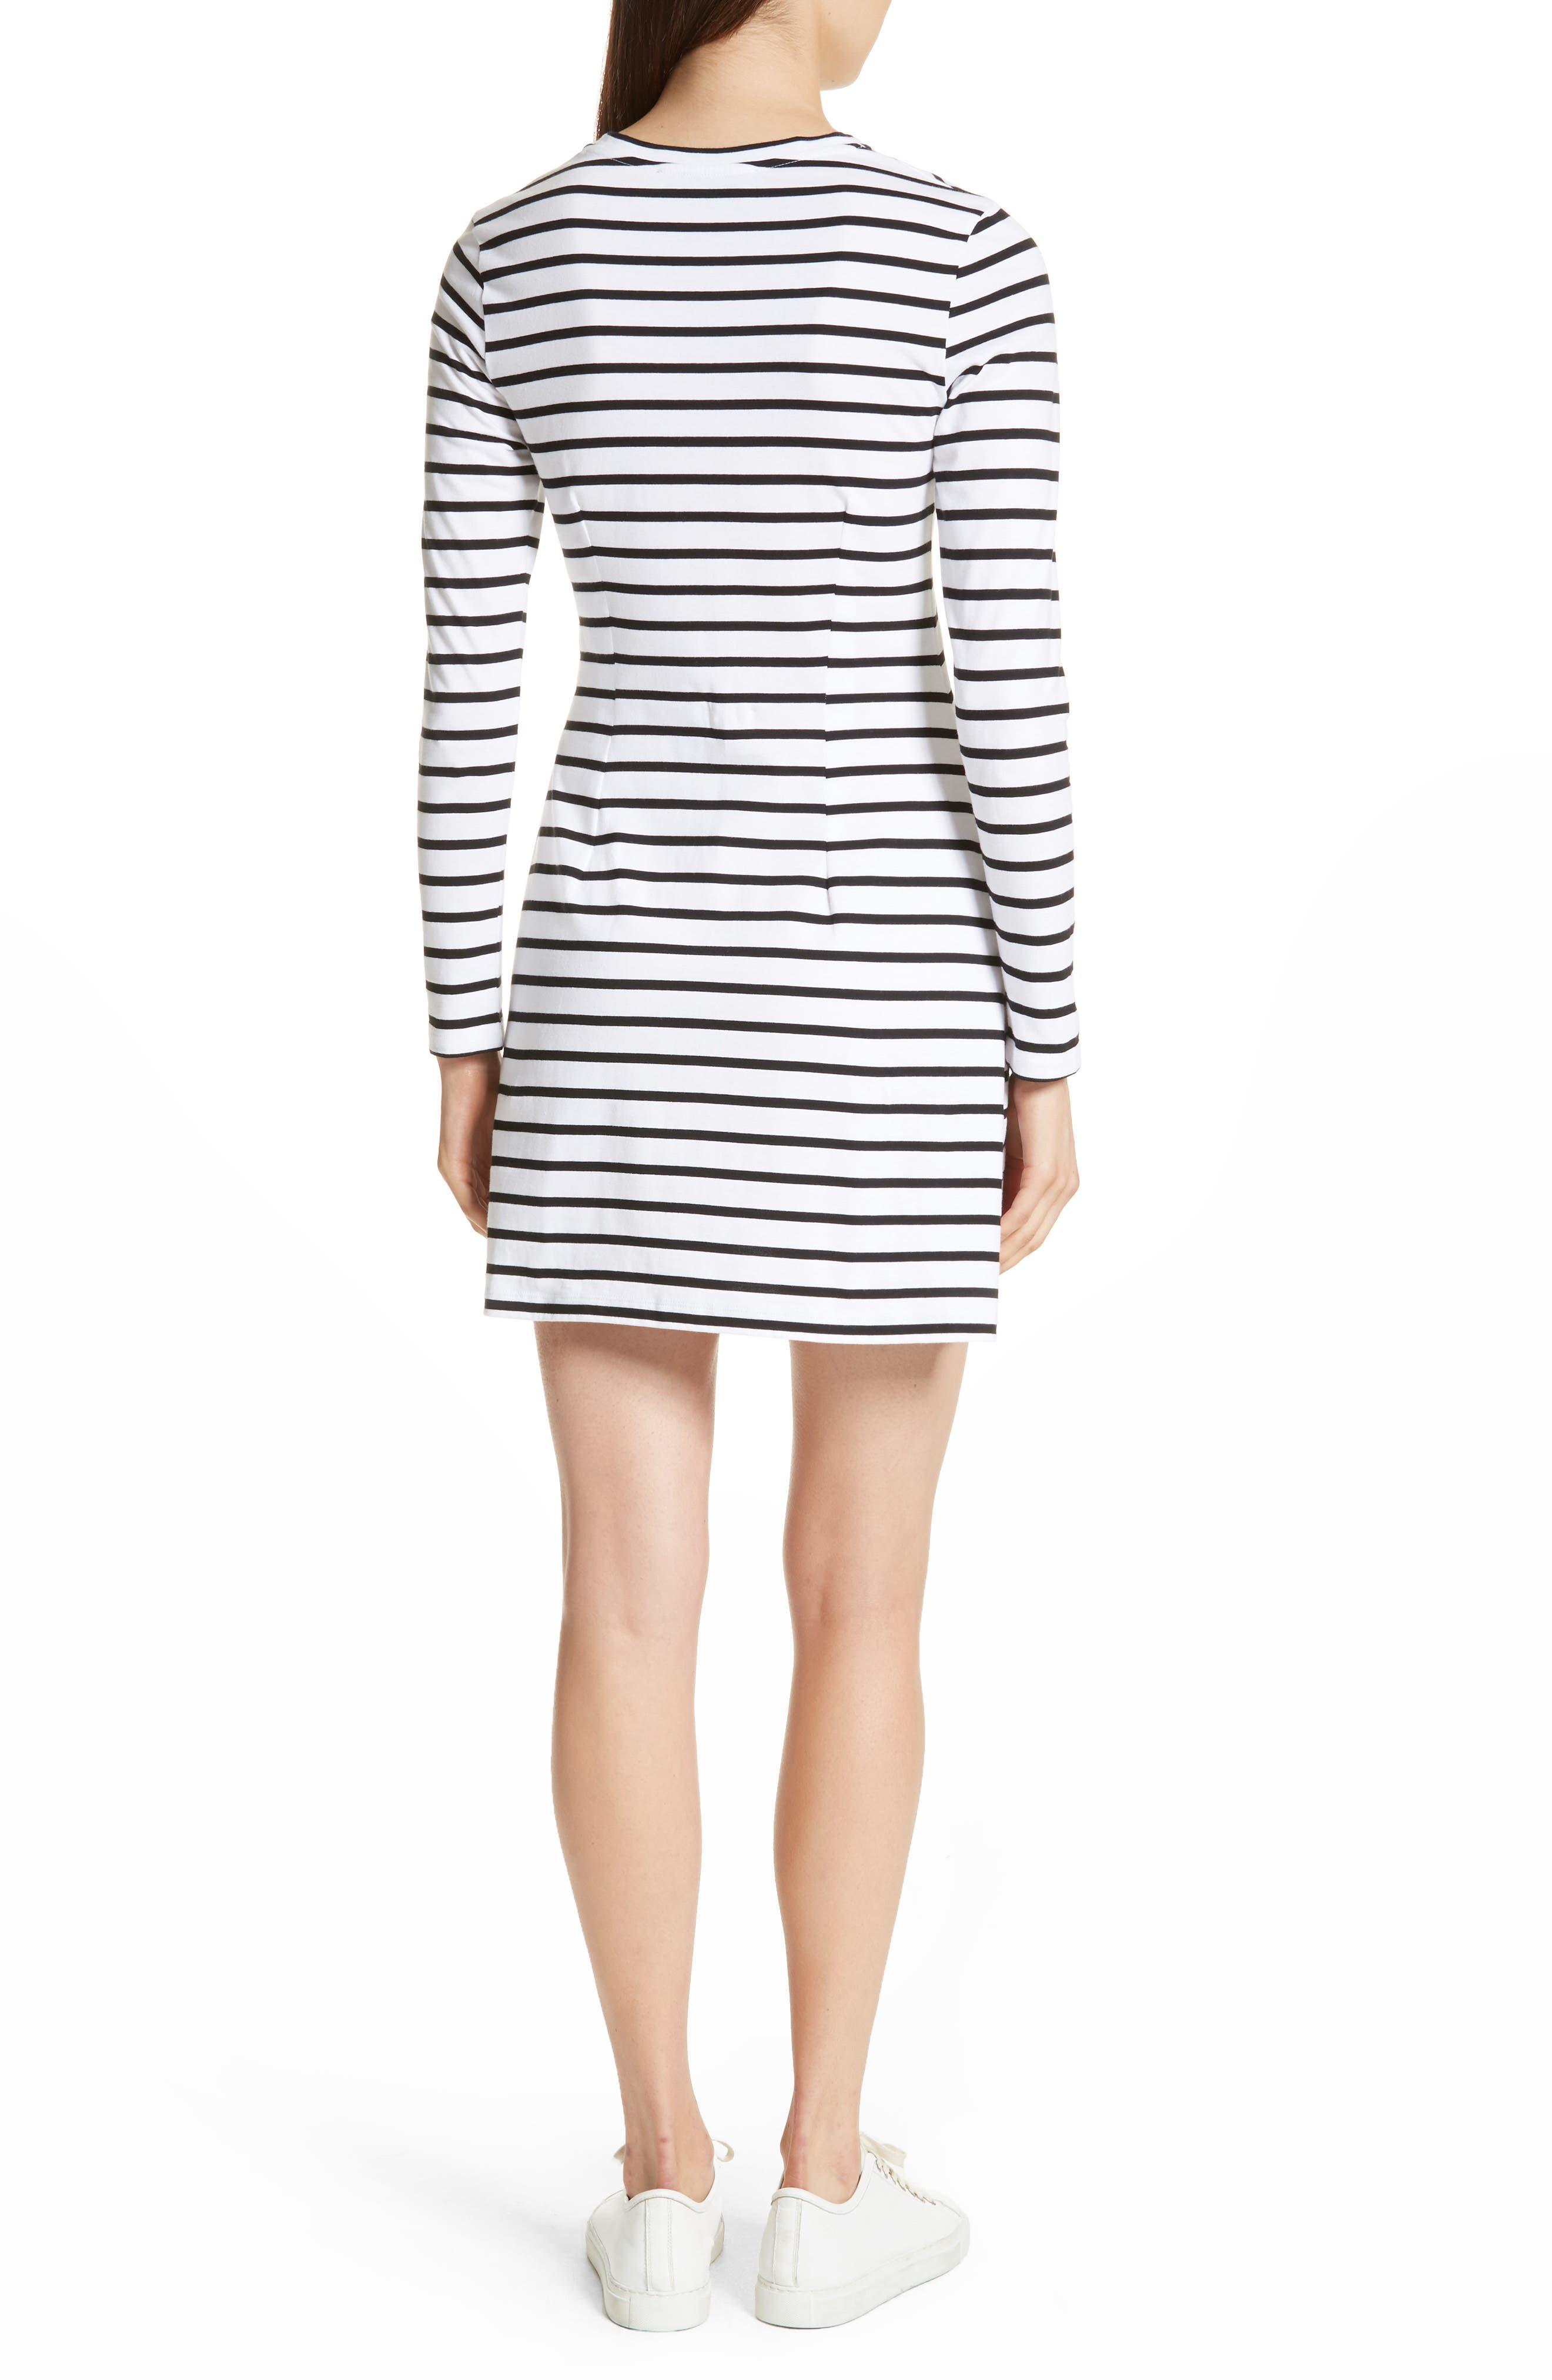 être cécile Scribble Dog Stripe T-Shirt Dress,                             Alternate thumbnail 3, color,                             Black Breton Stripe